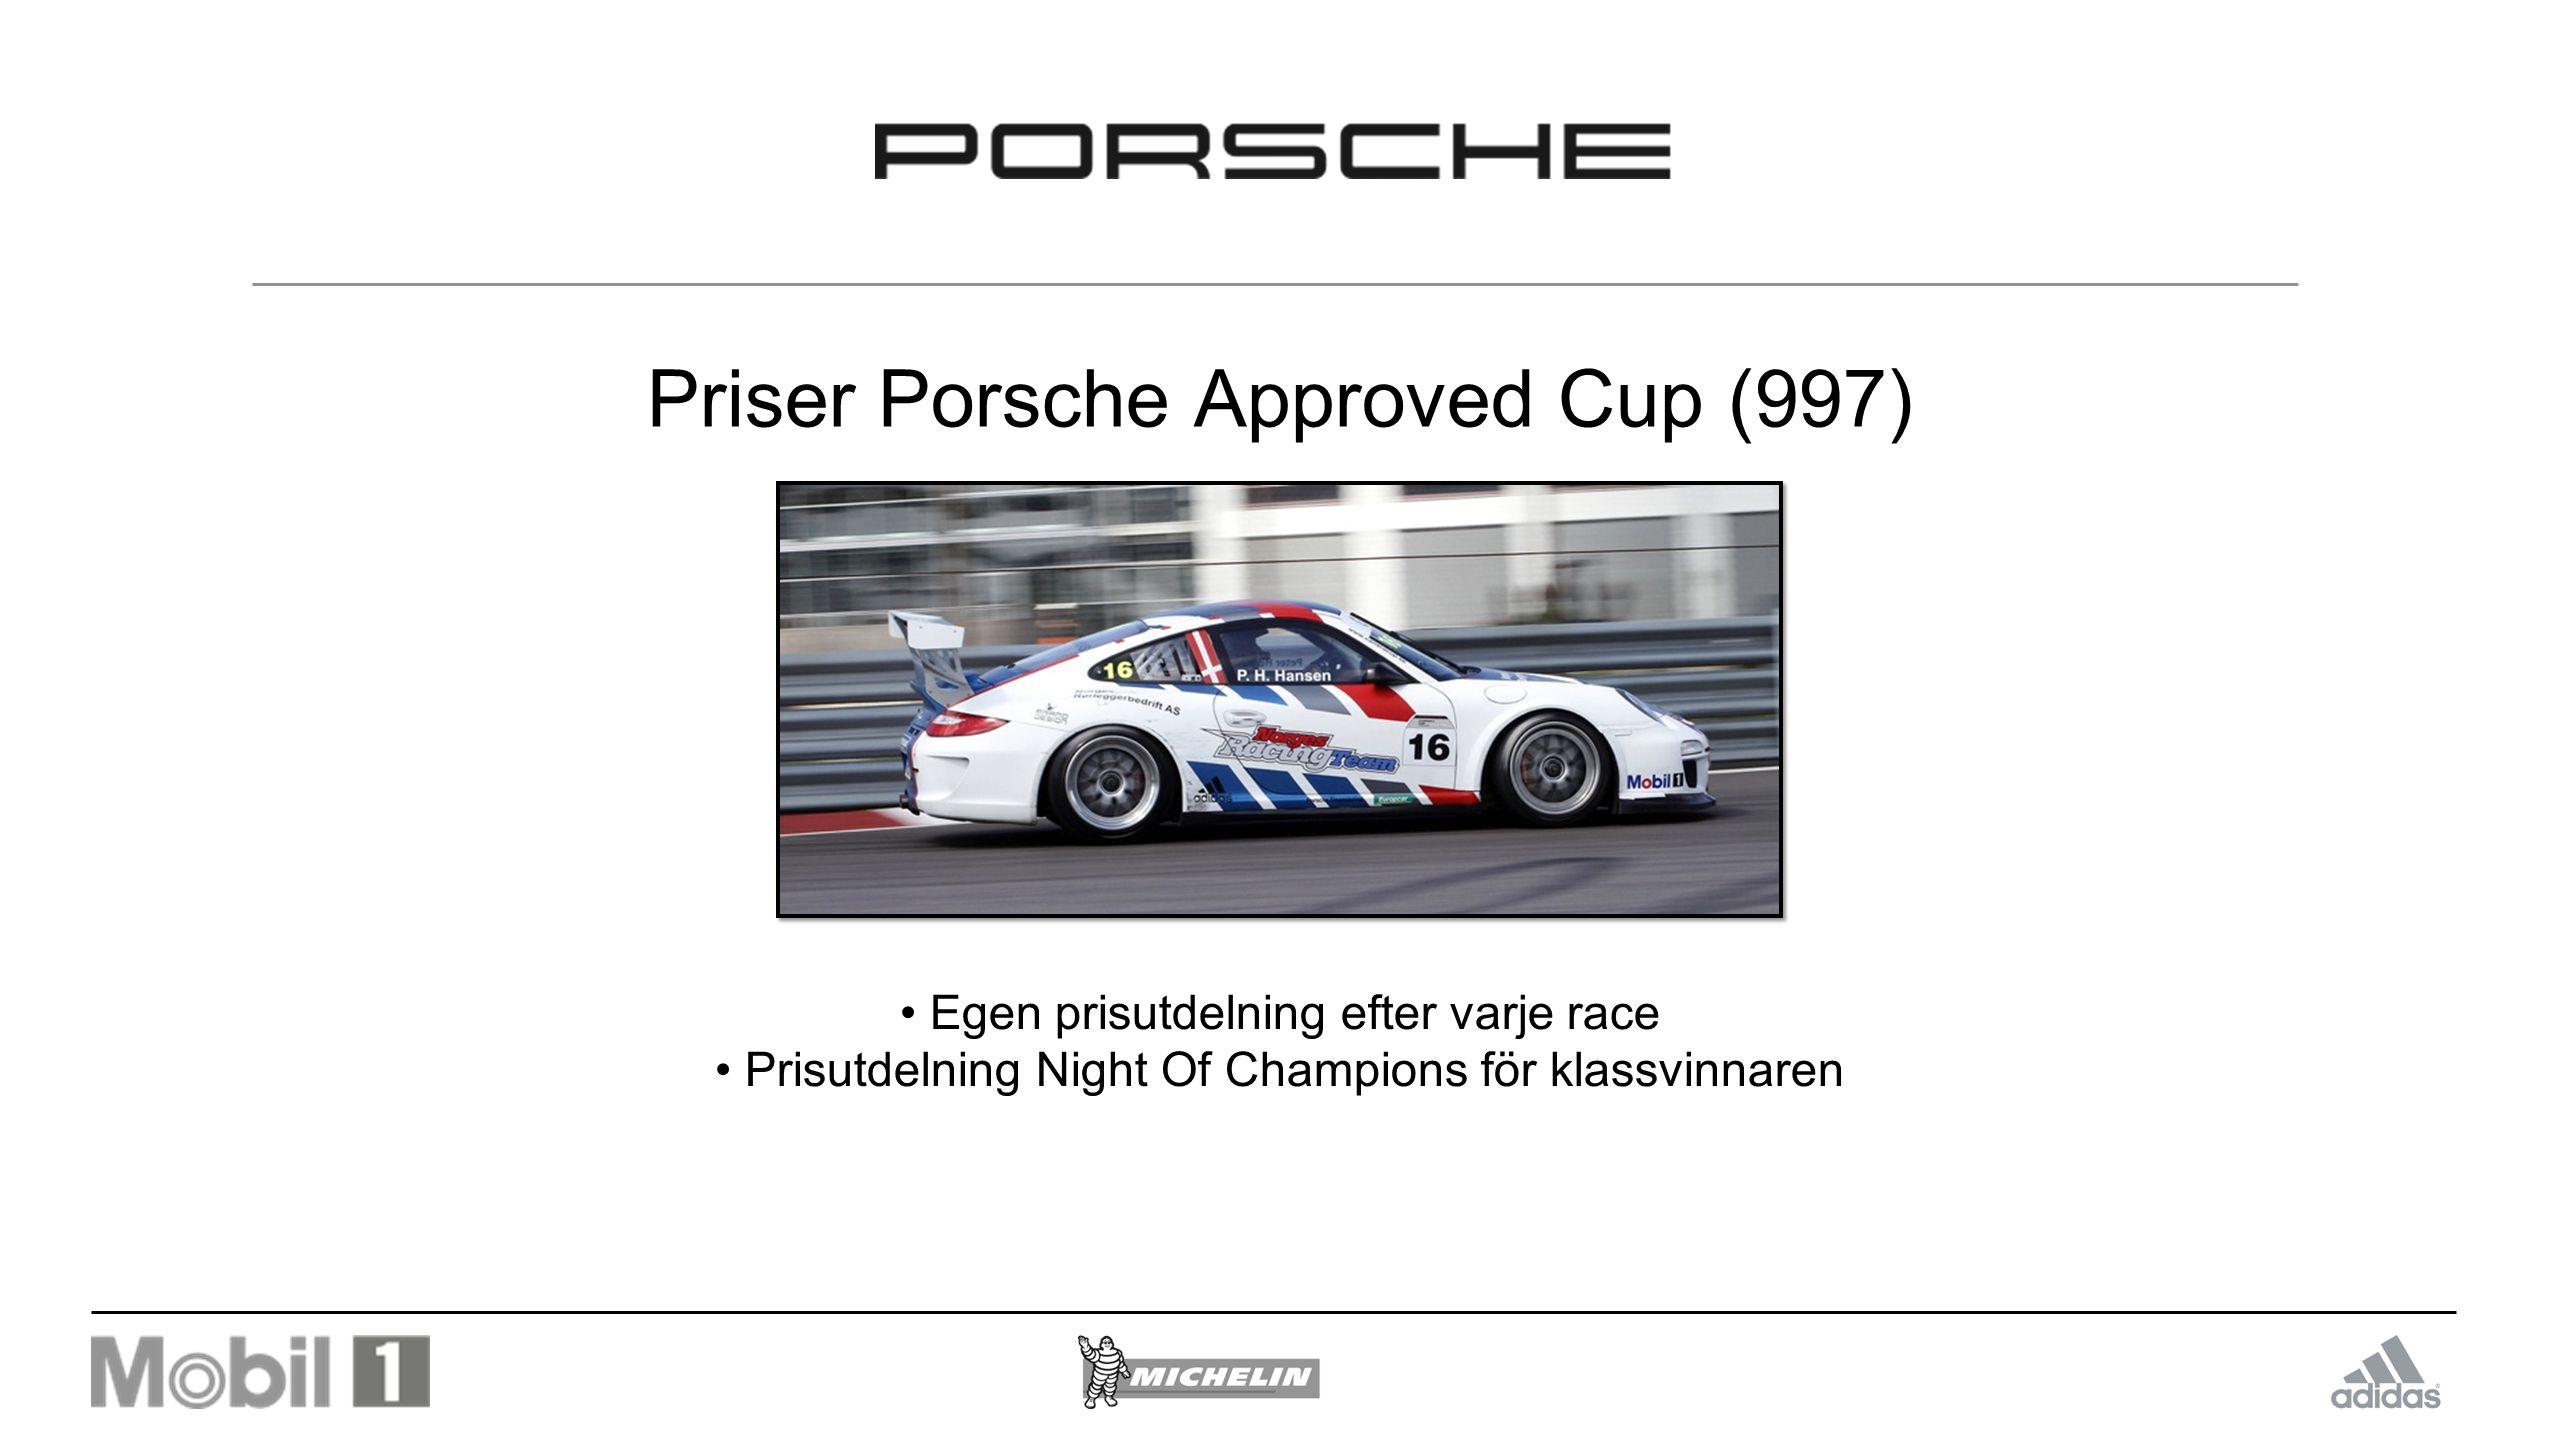 Priser Porsche Approved Cup (997)